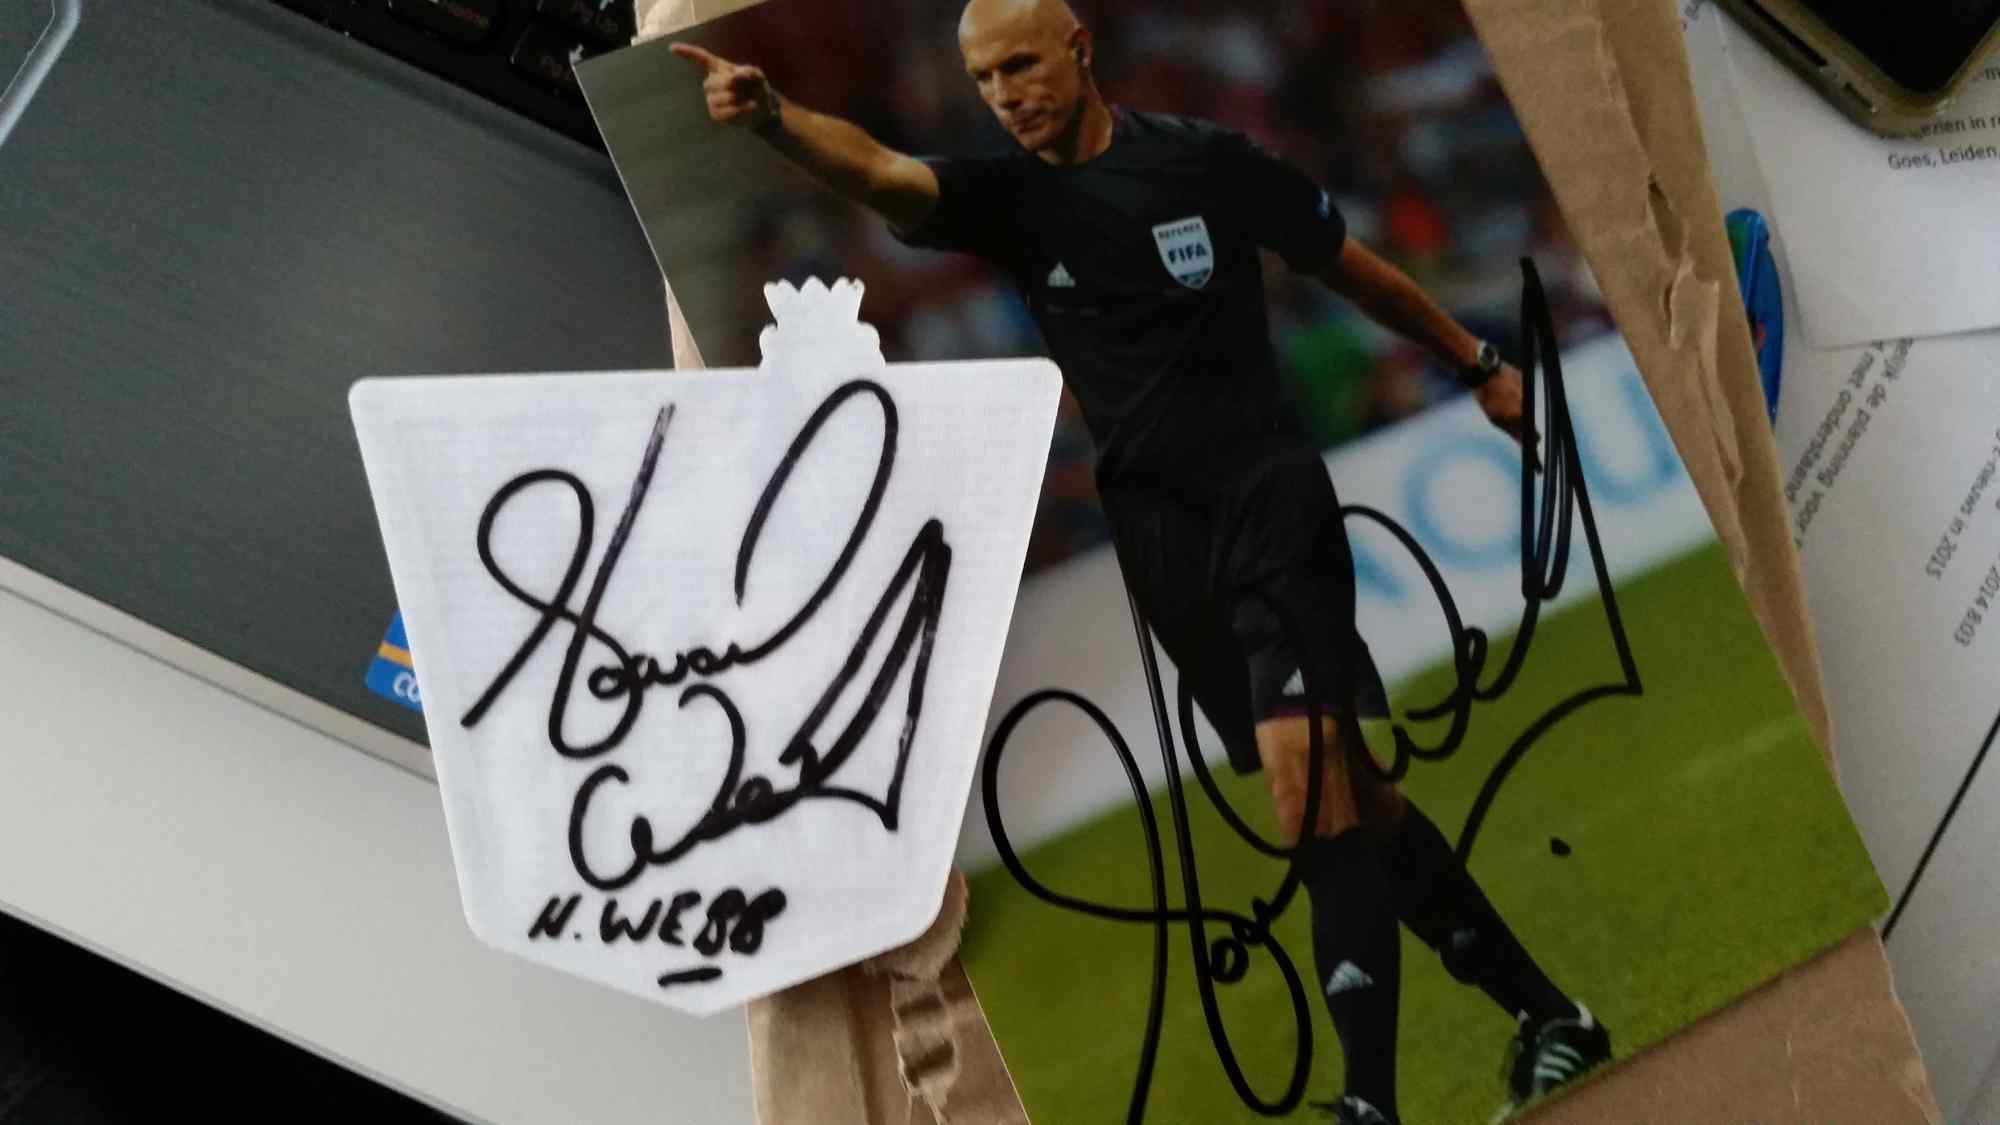 Howard Webb autographed referee badge